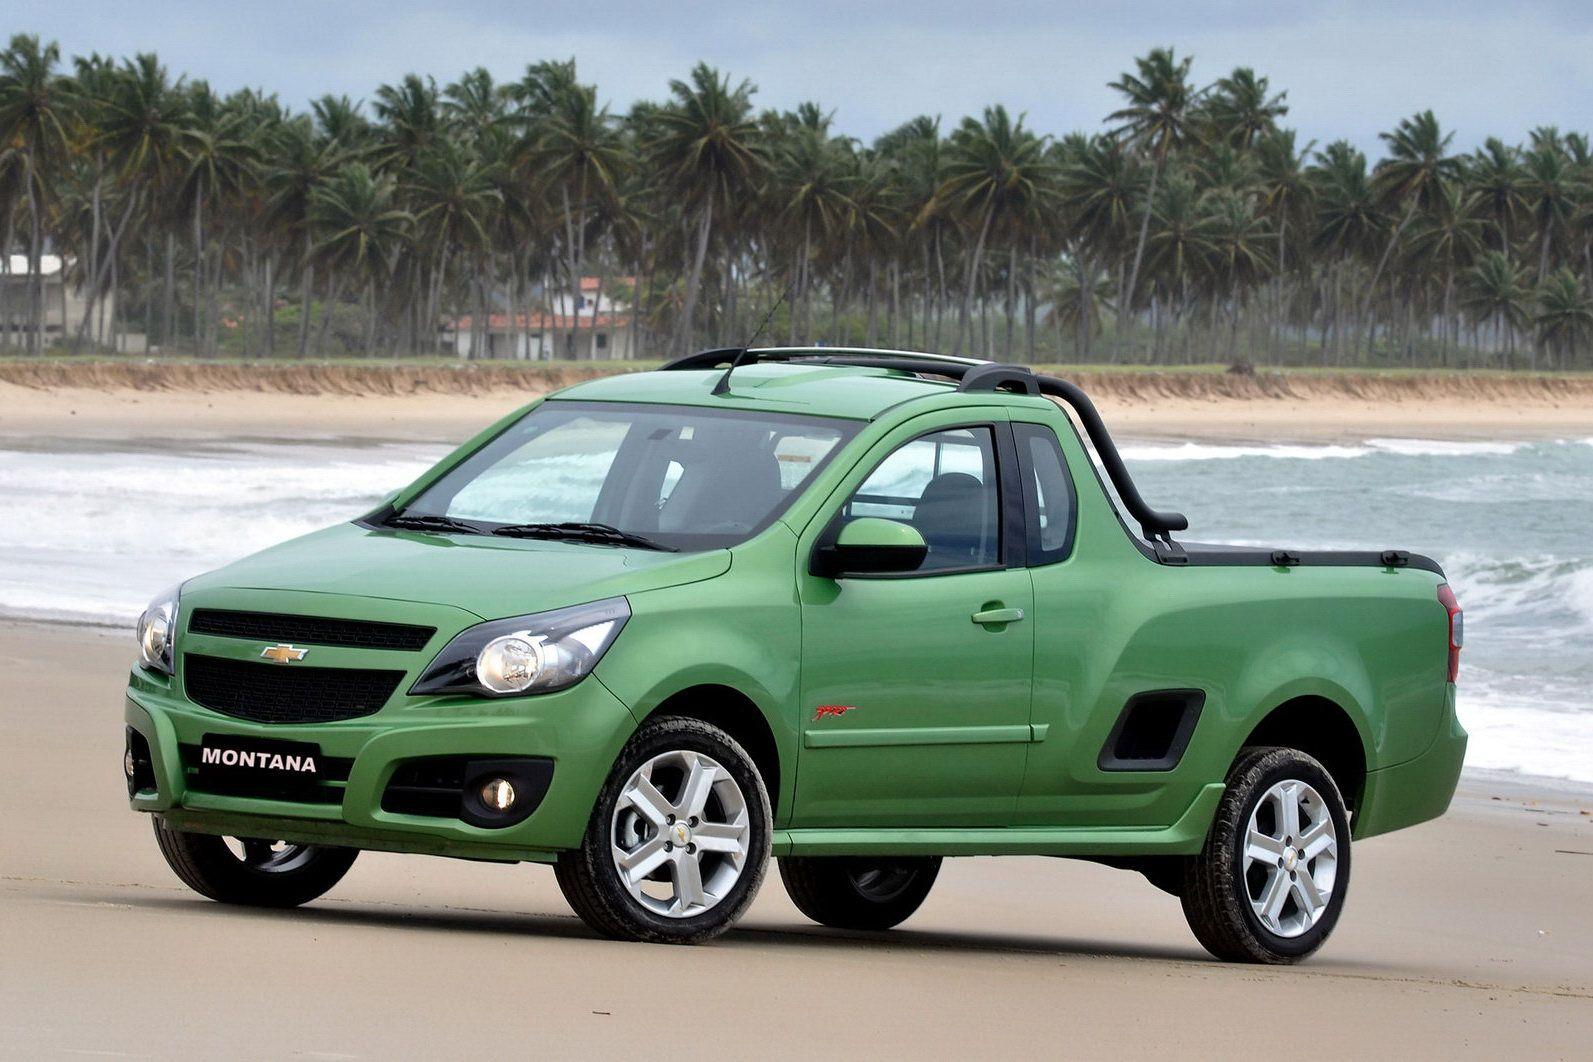 Chevrolet Tornado Wallpapics Com Wallpapers And Hd Pictures Chevrolet Compact Trucks Small Pickup Trucks